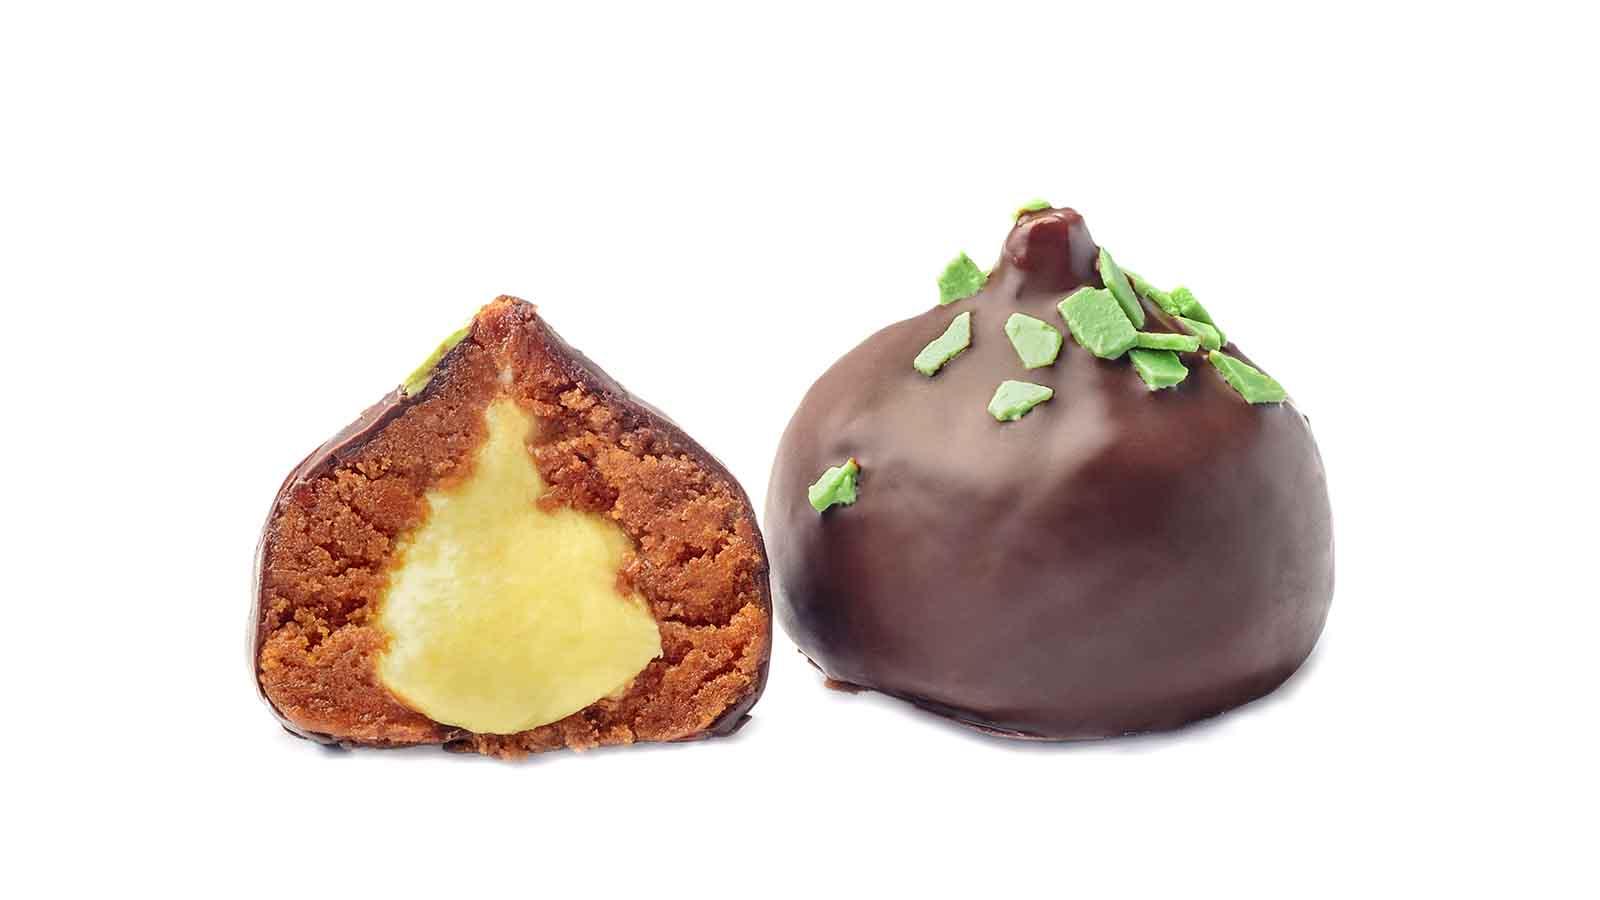 Honey dessert with pistachio filling